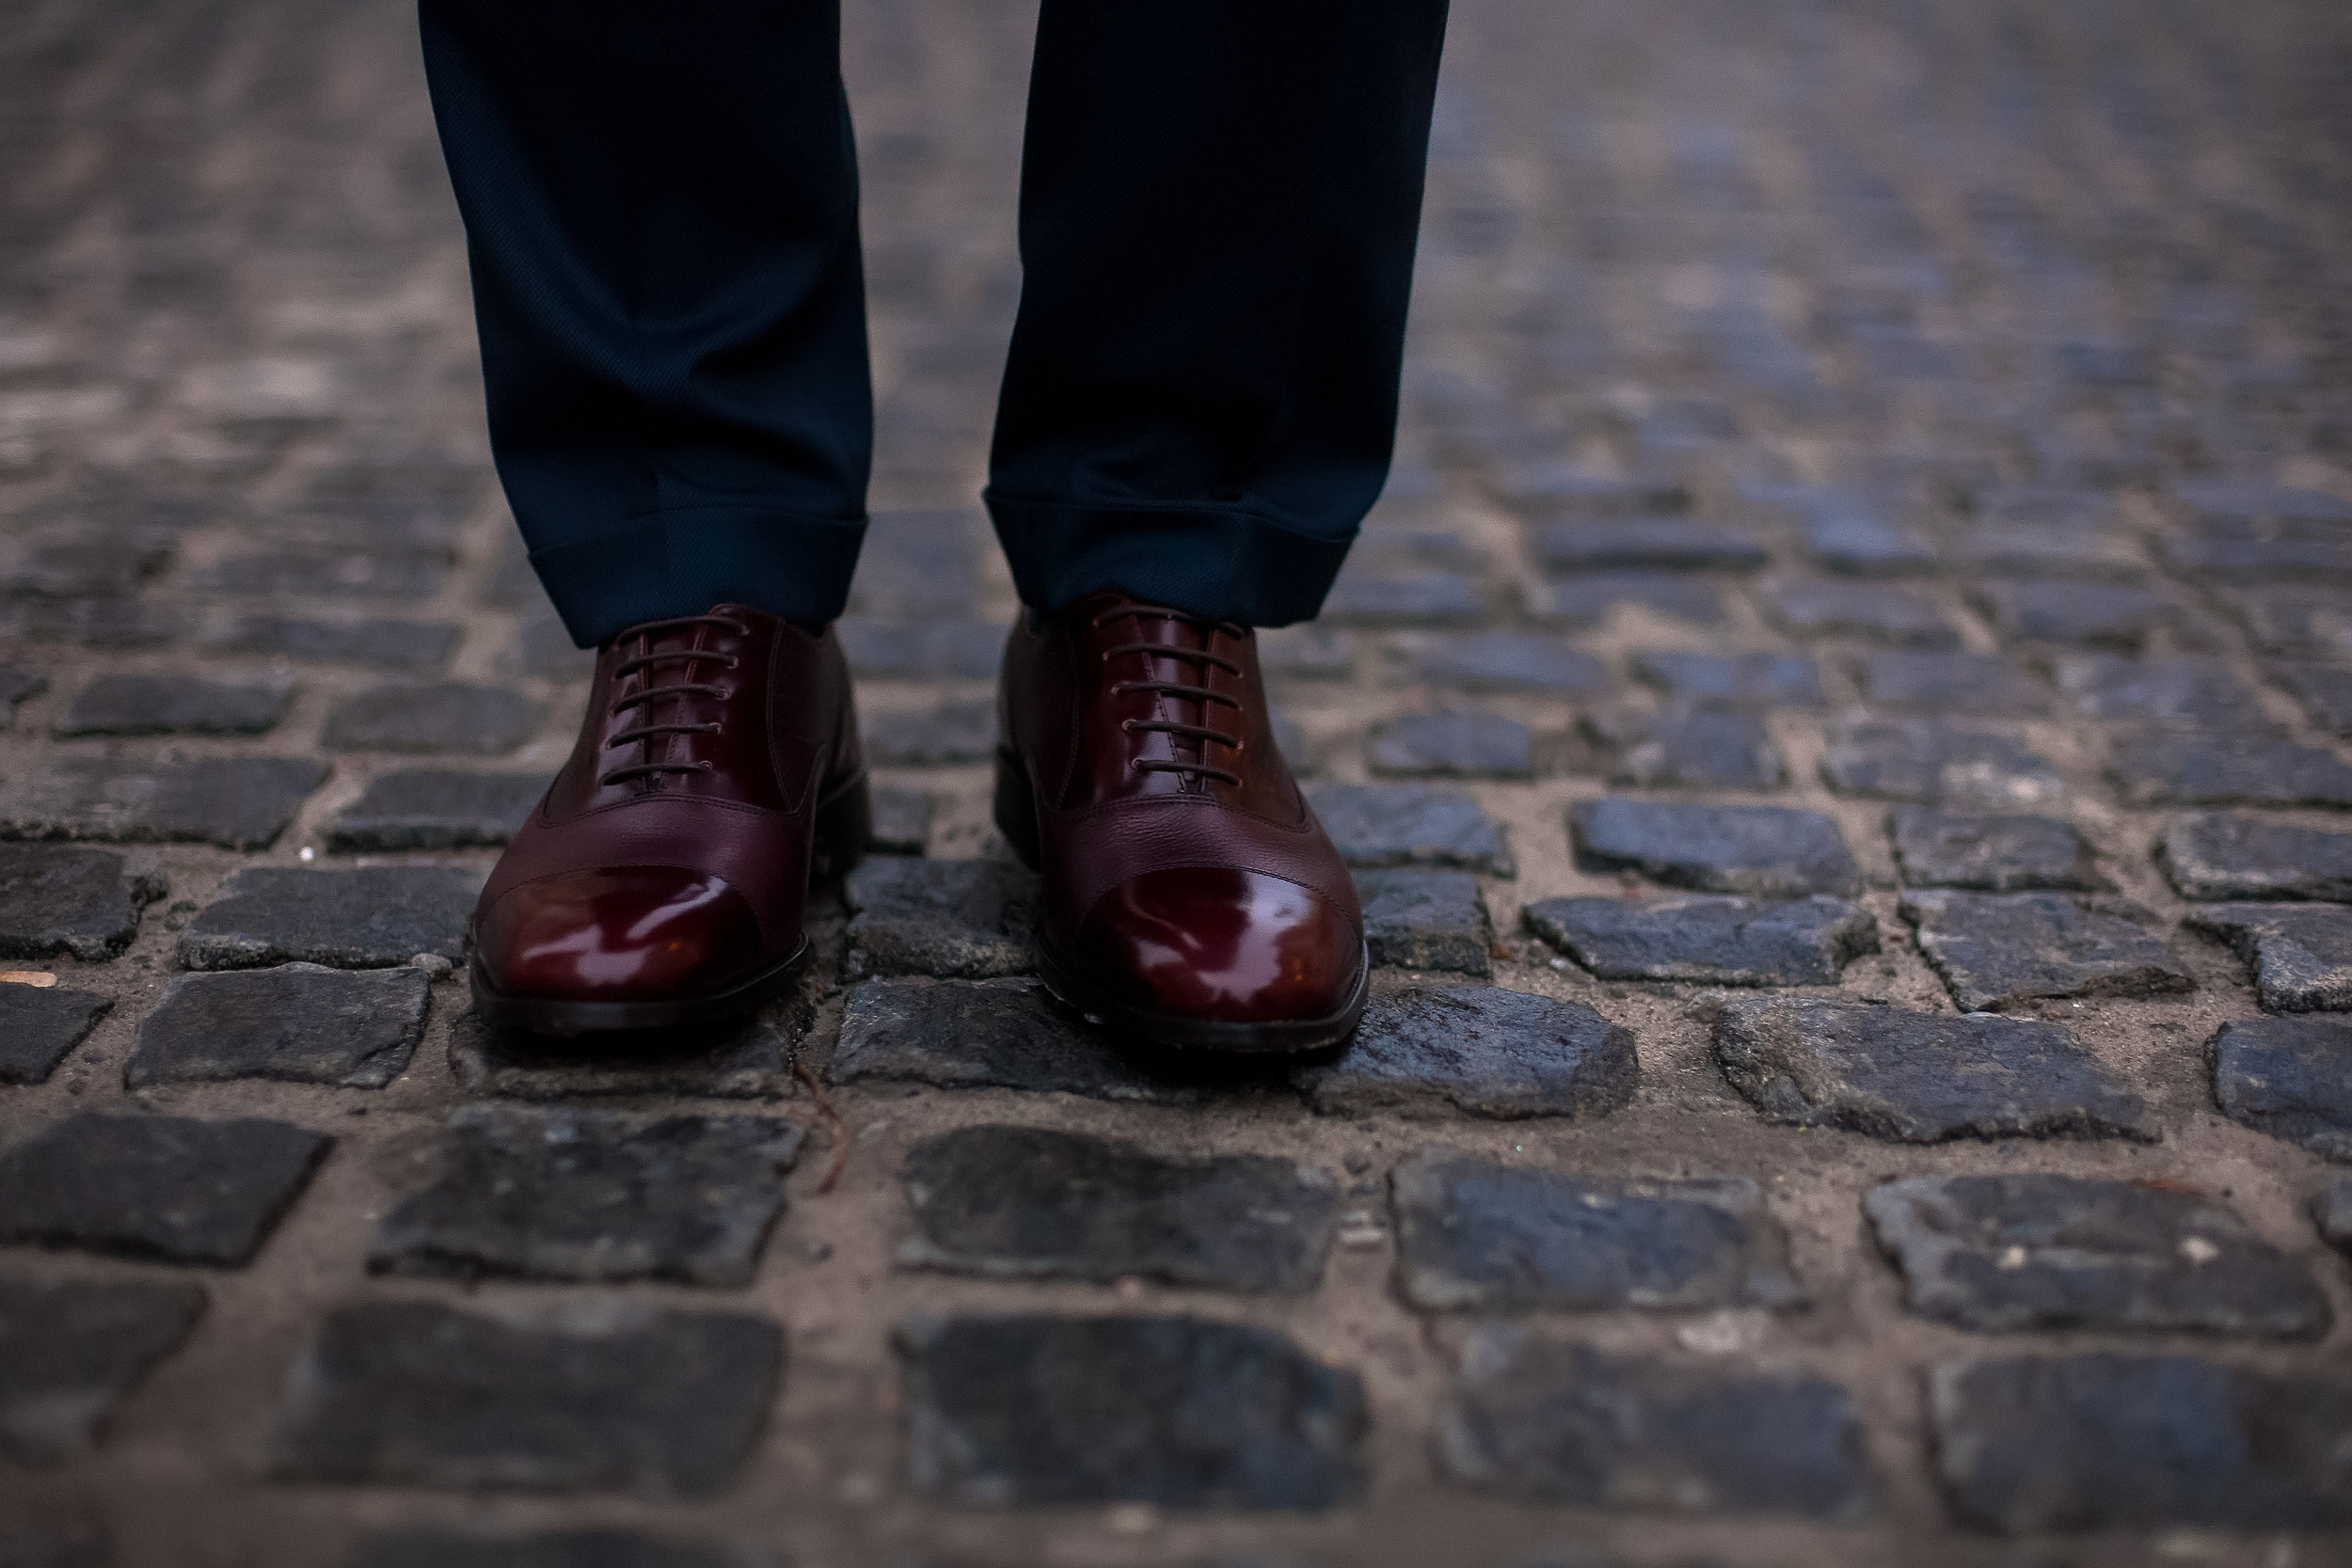 stock-photo-men-man-shoes-street-city-459168412.jpg